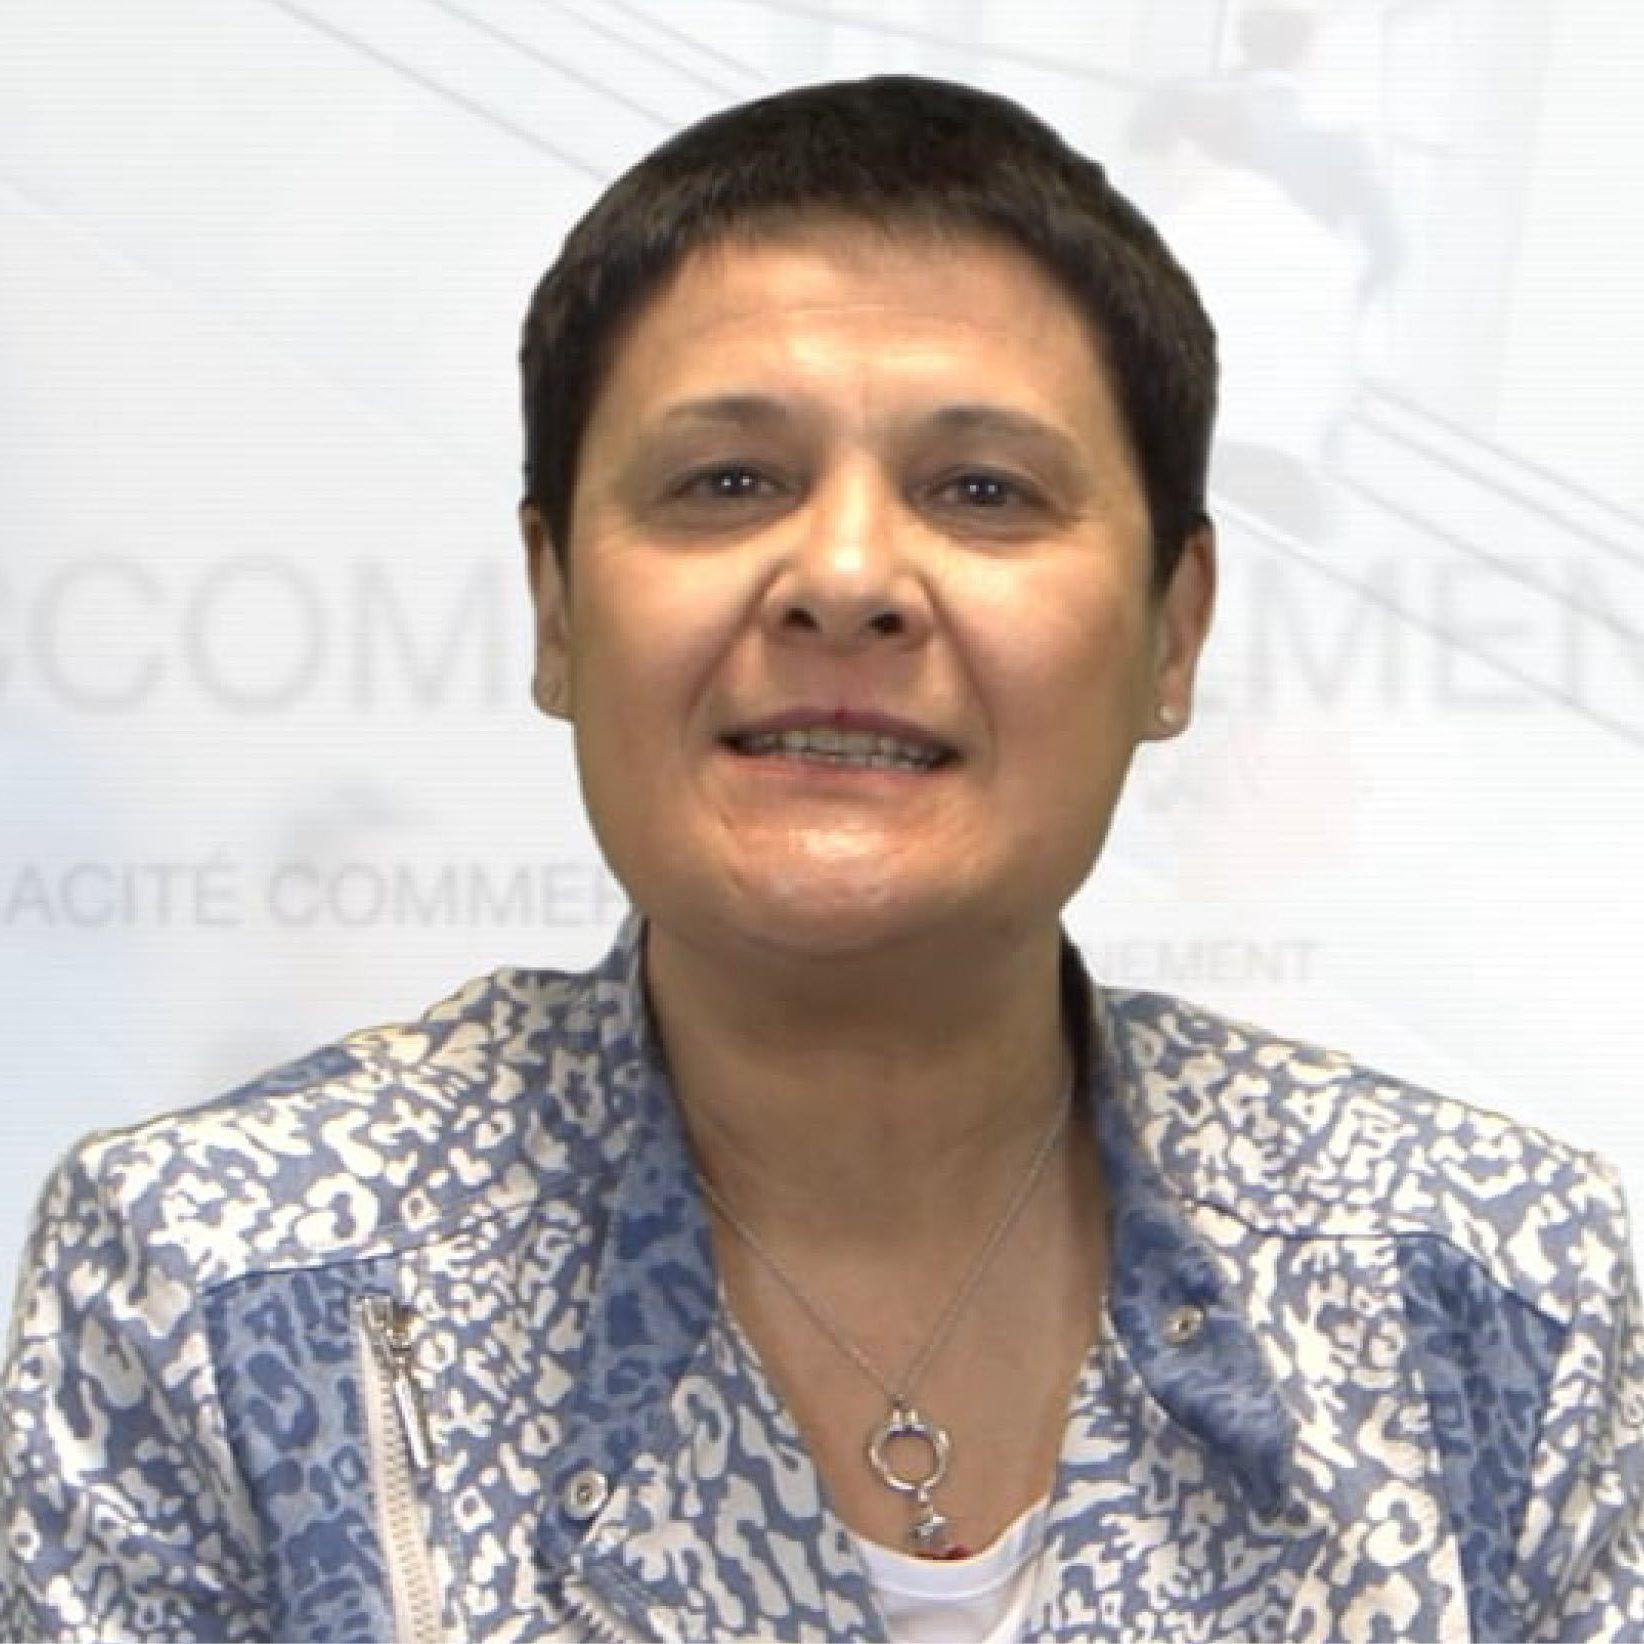 Nadine Squimbre Cabinet Affaires directes